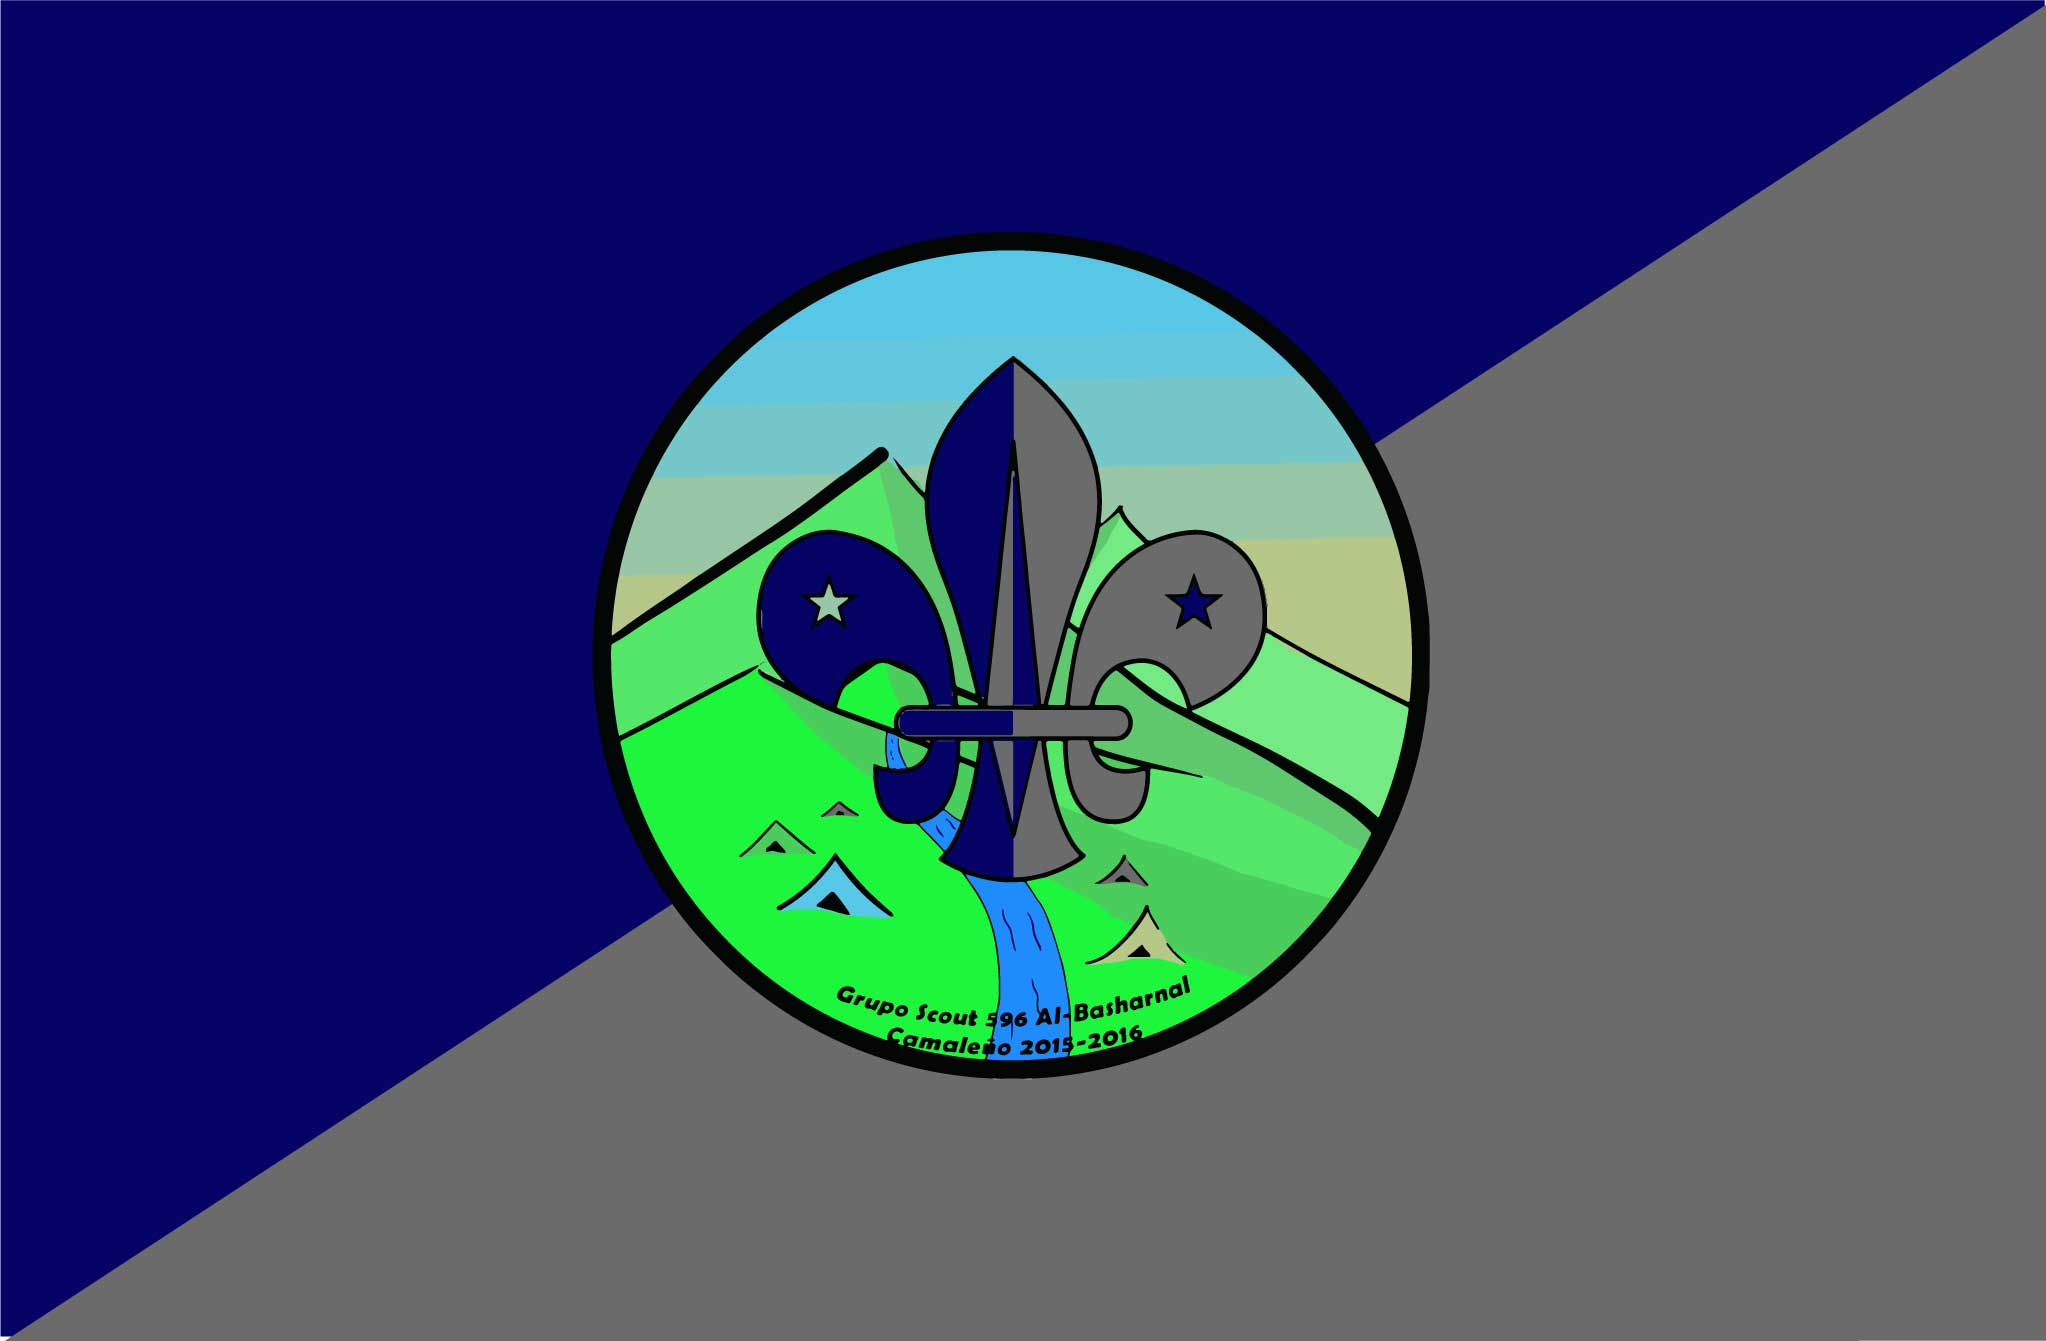 Bandera Al basharnal